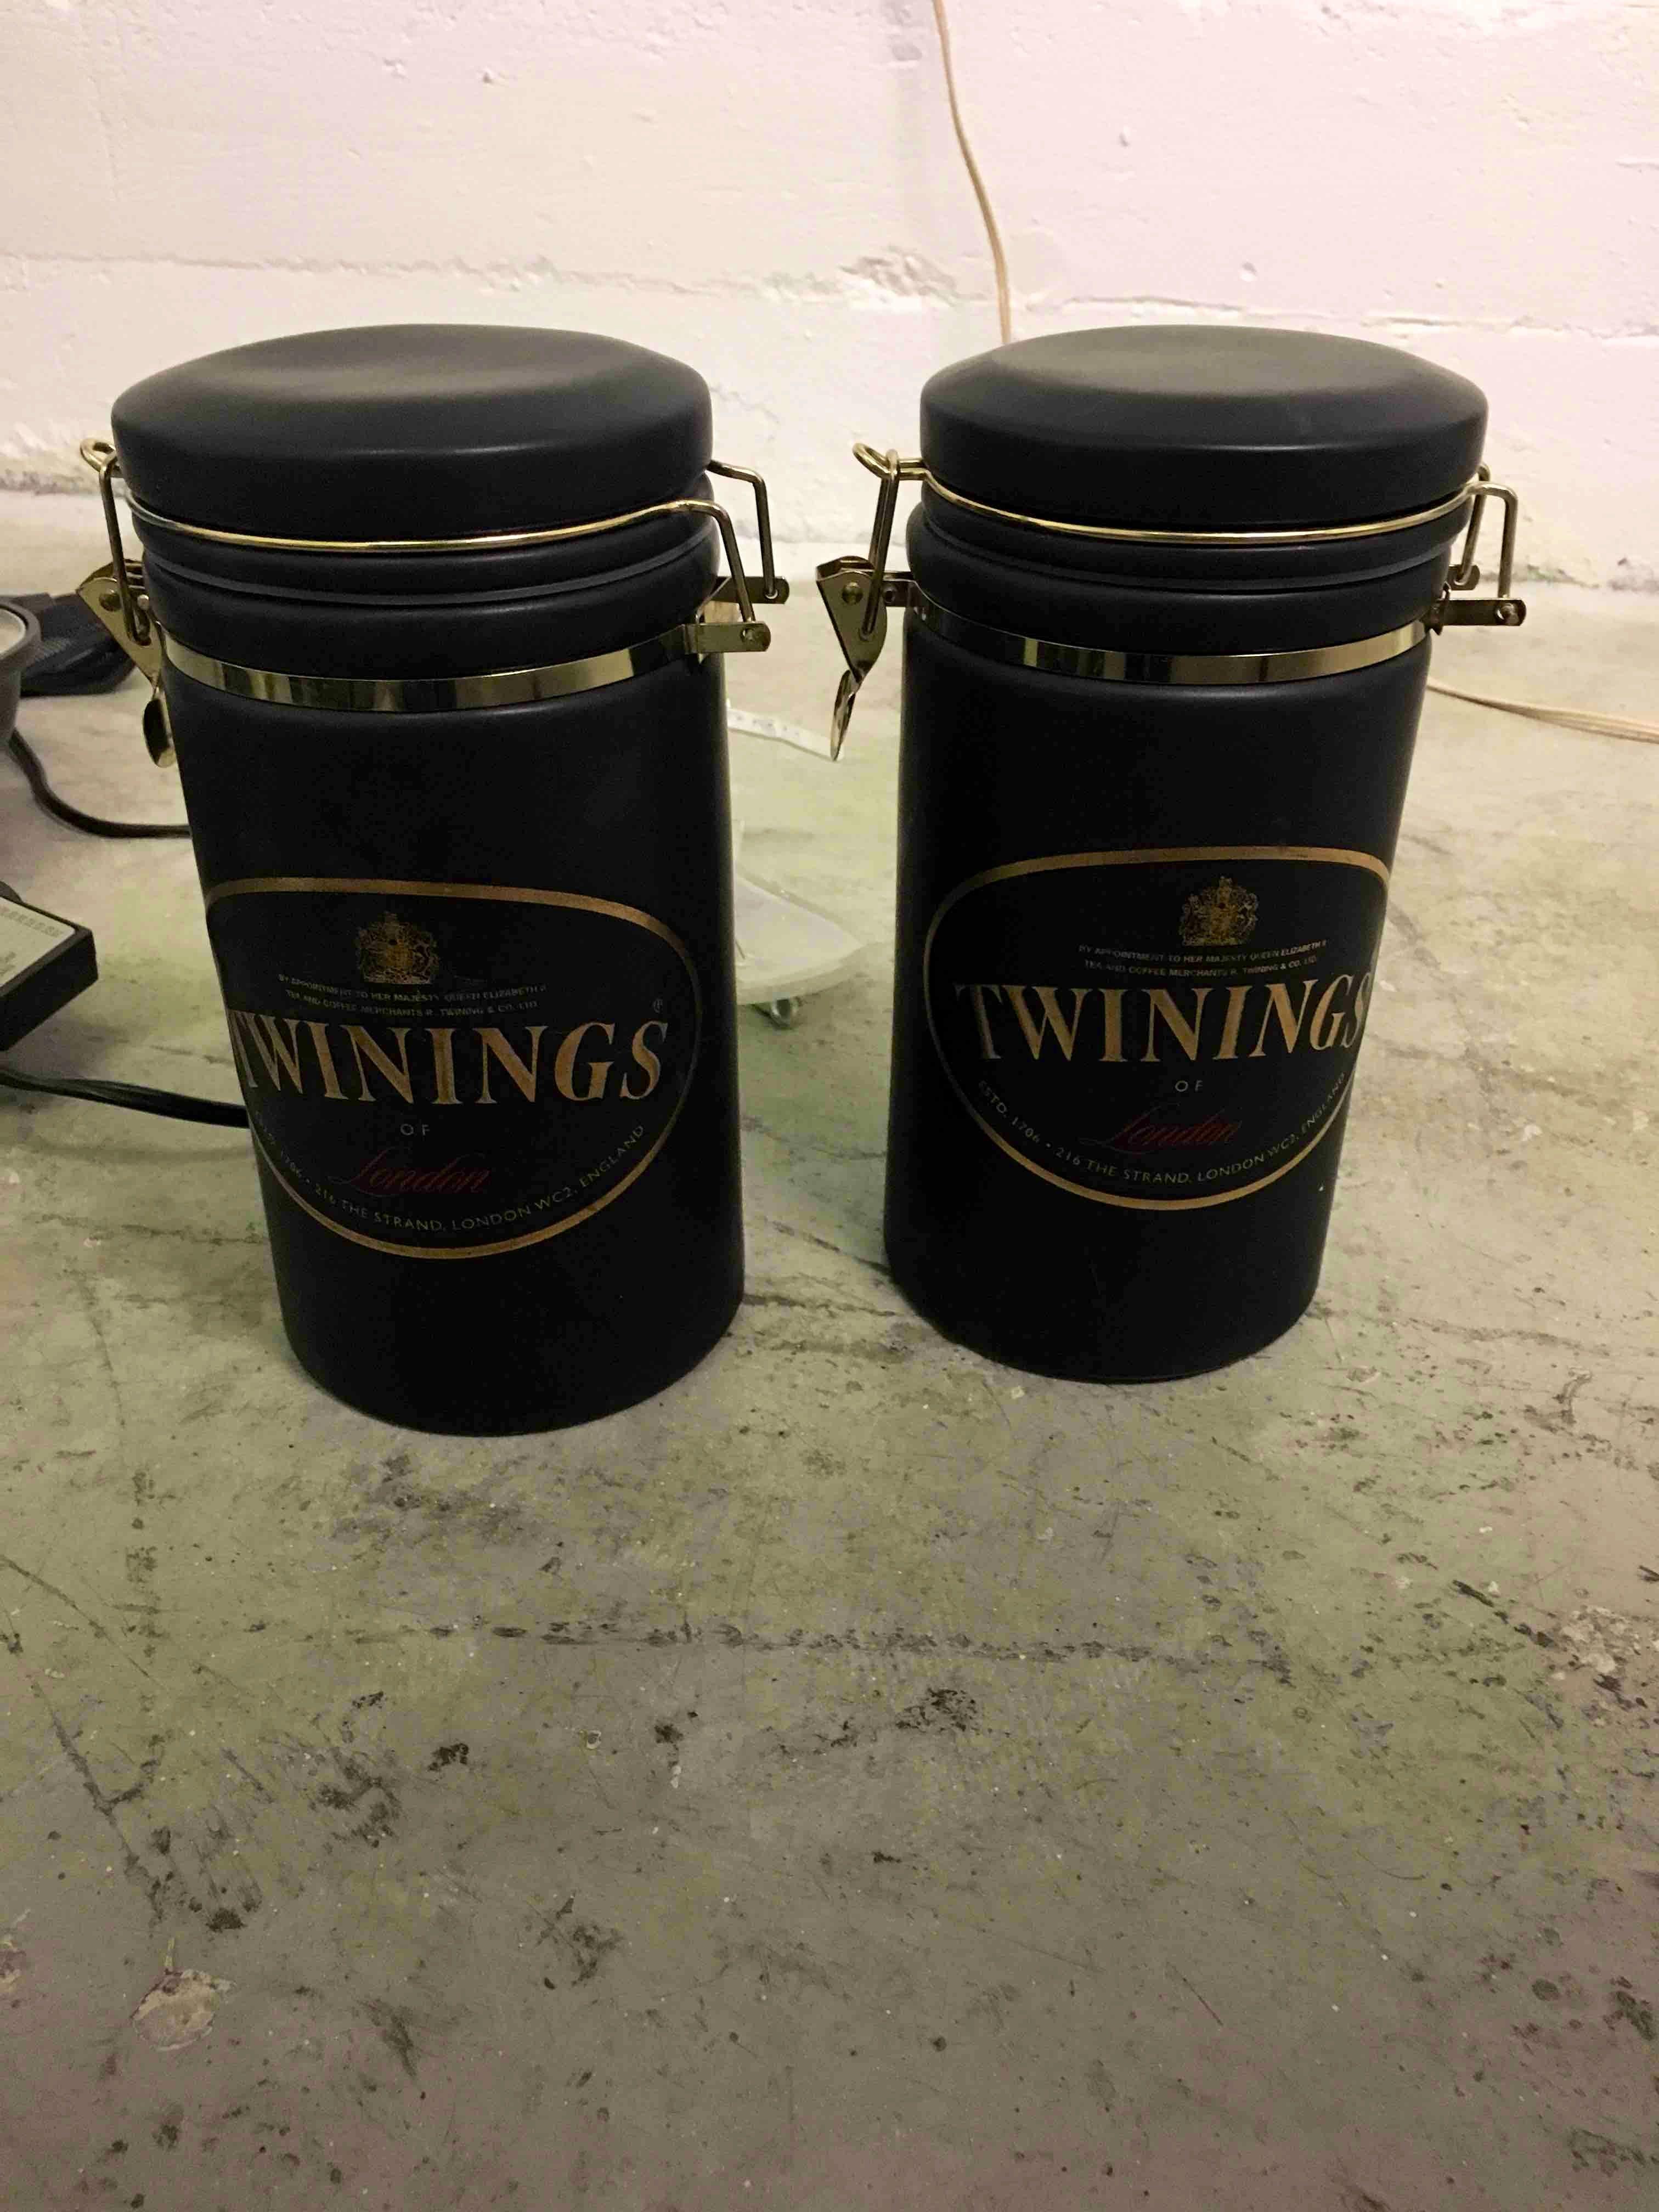 Twinings of London jars